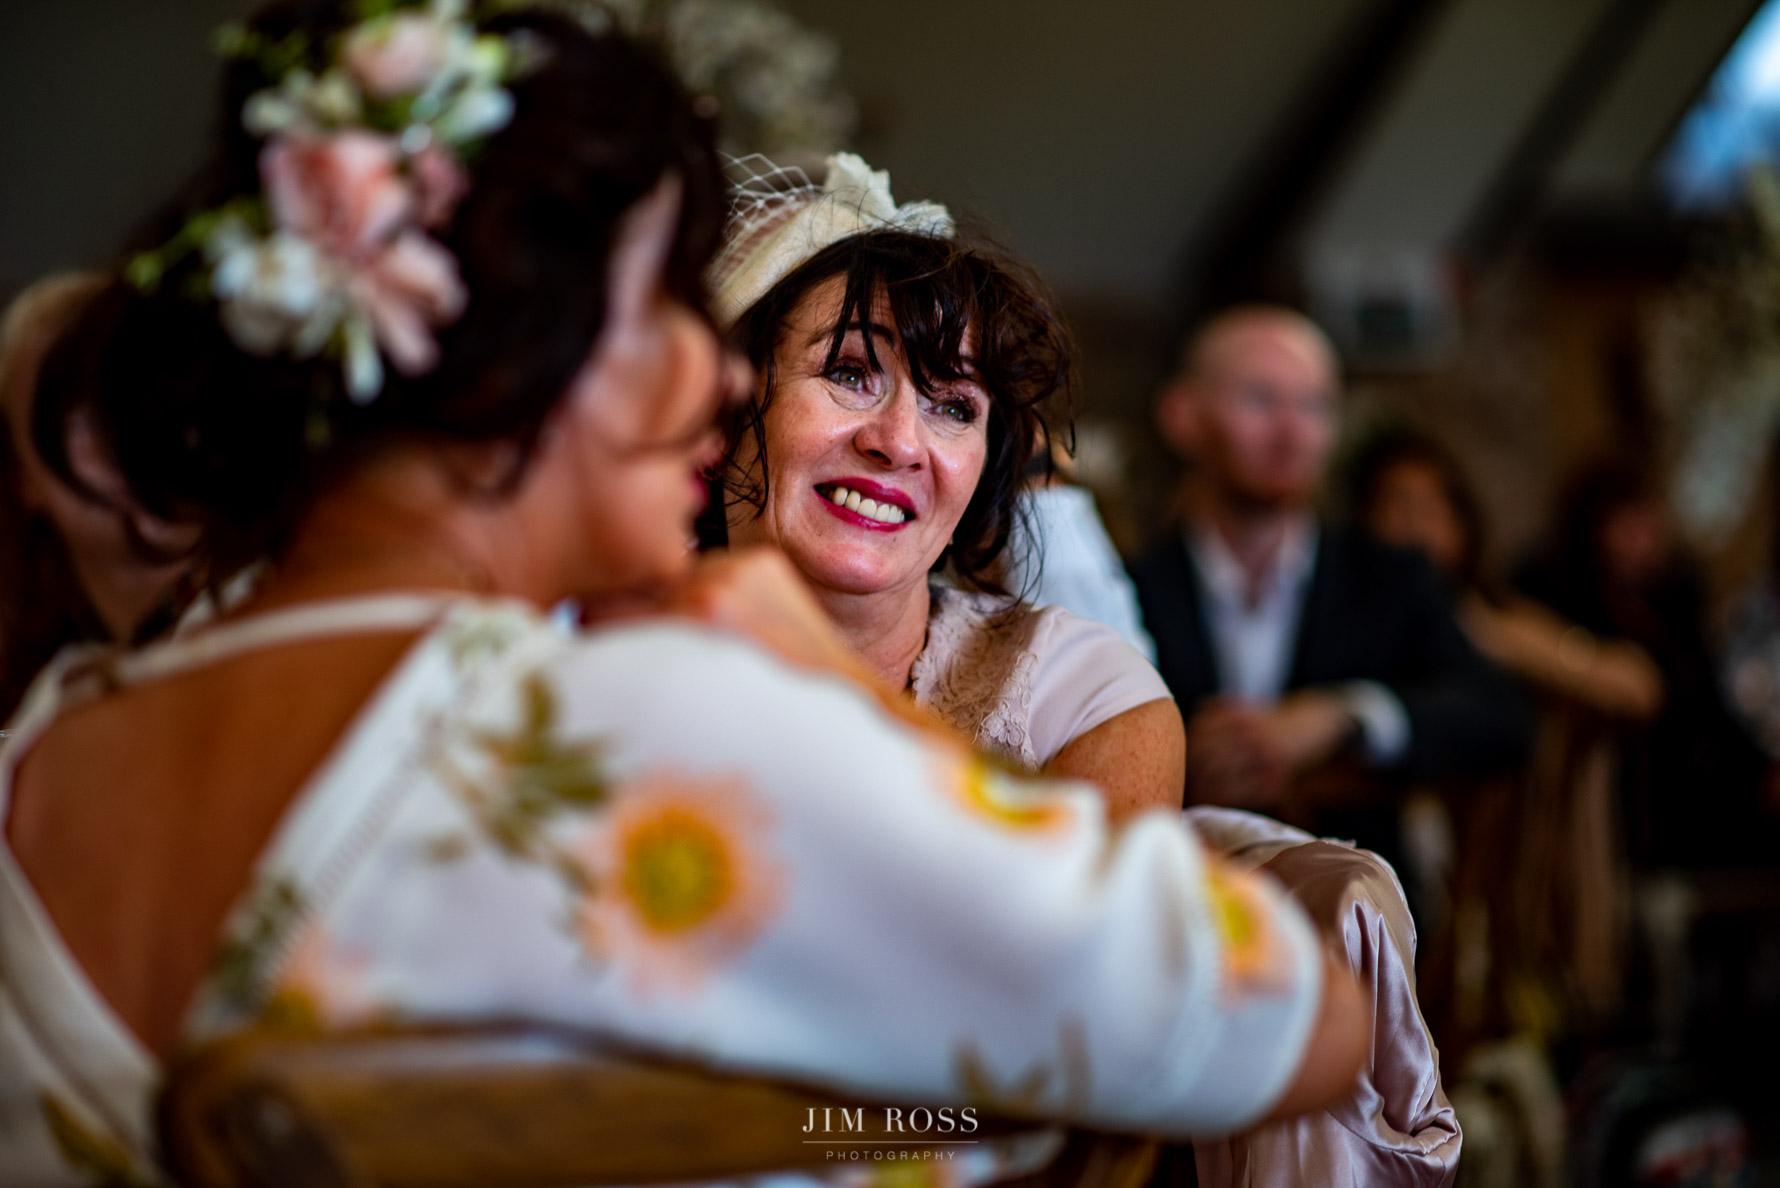 Emotional response to wedding speech